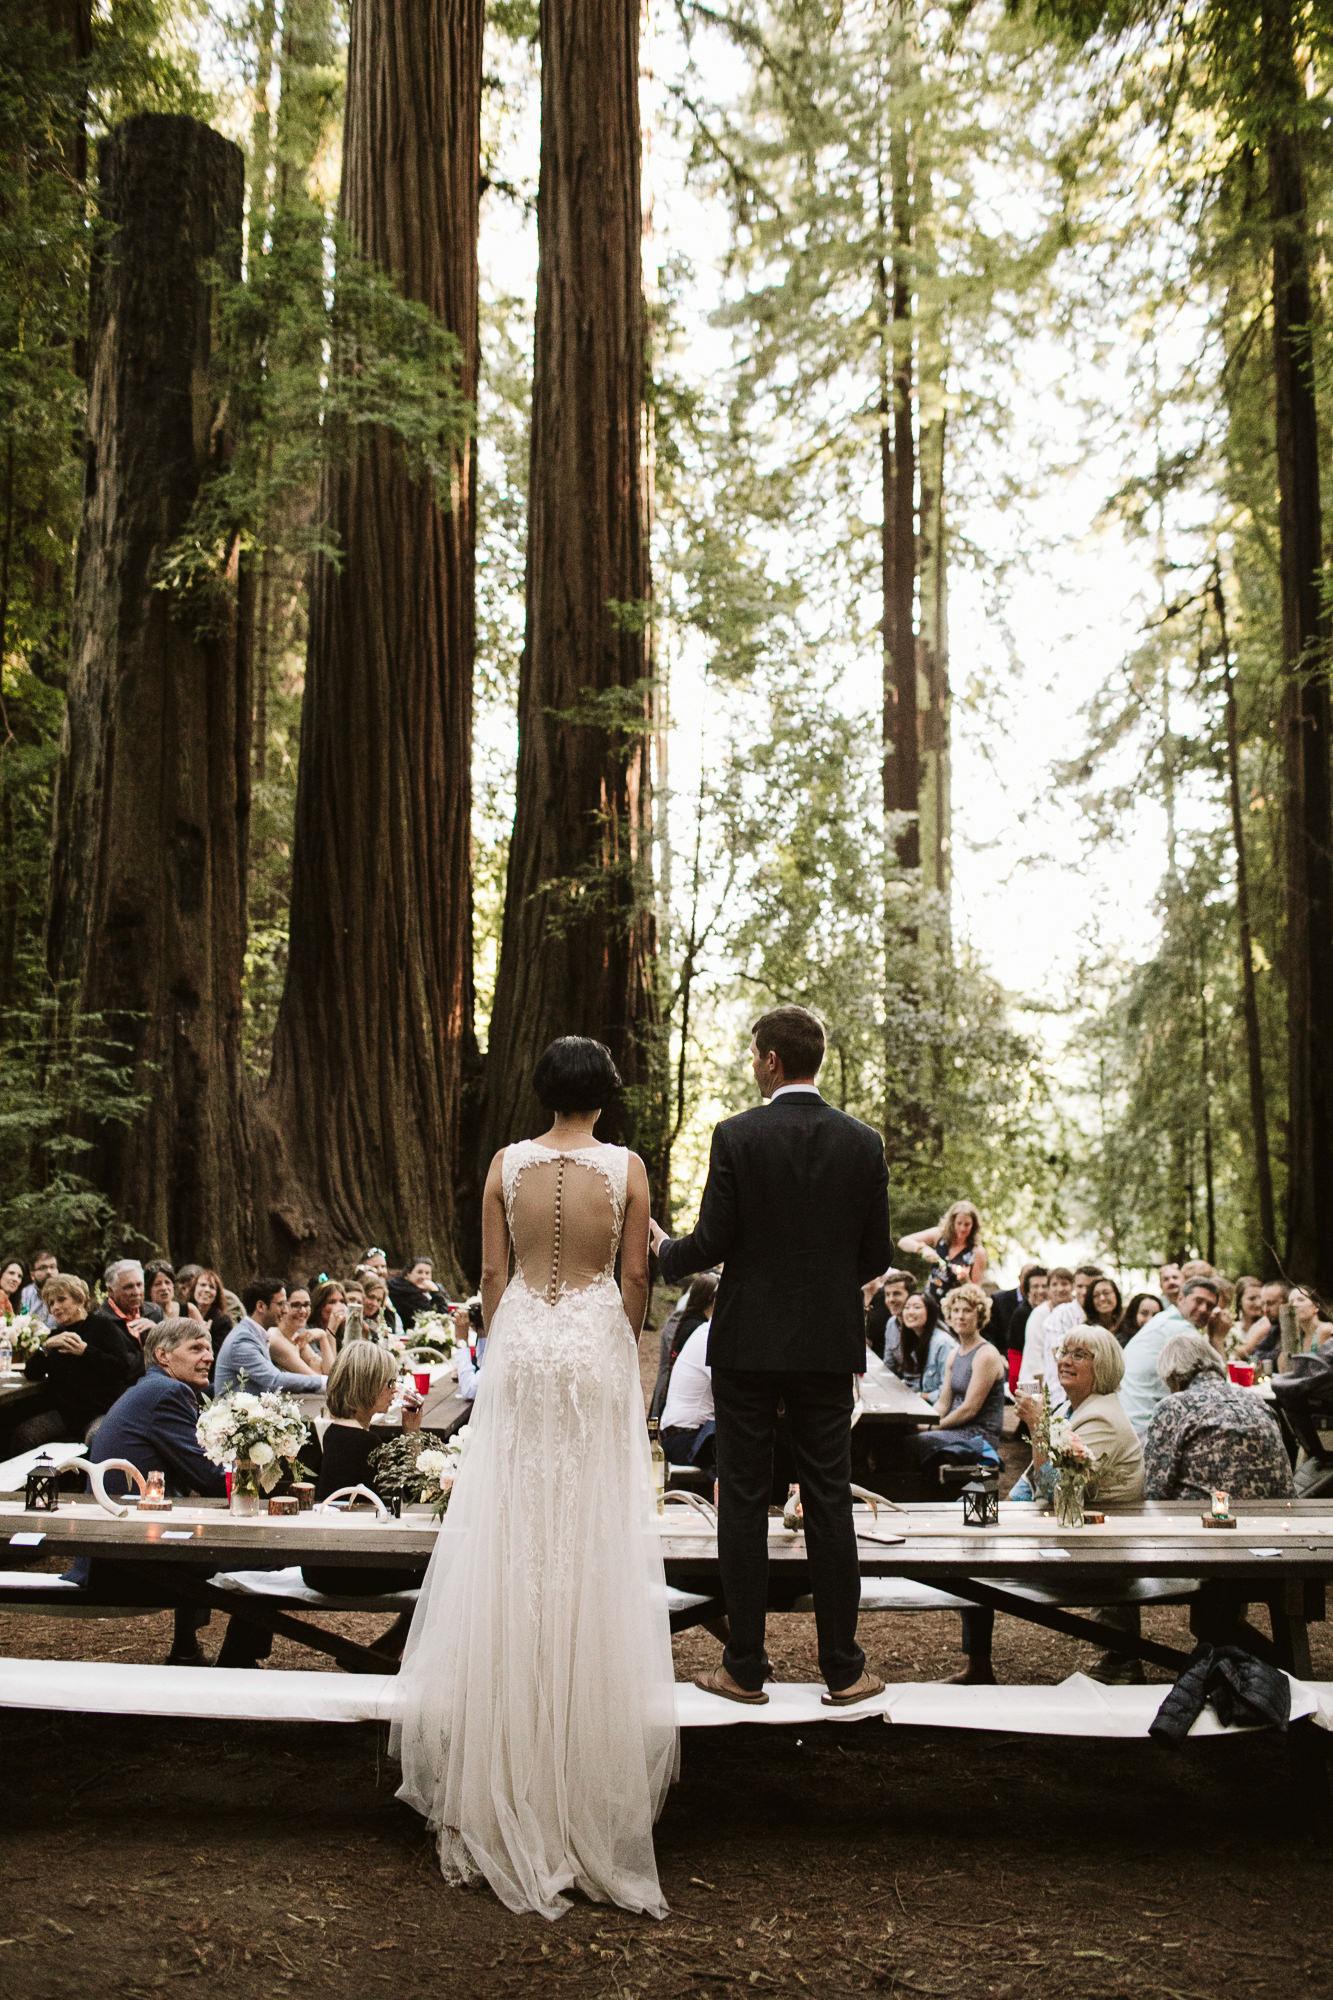 California-wedding-photographer-alfonso-flores-pamplin-groove-311.jpg